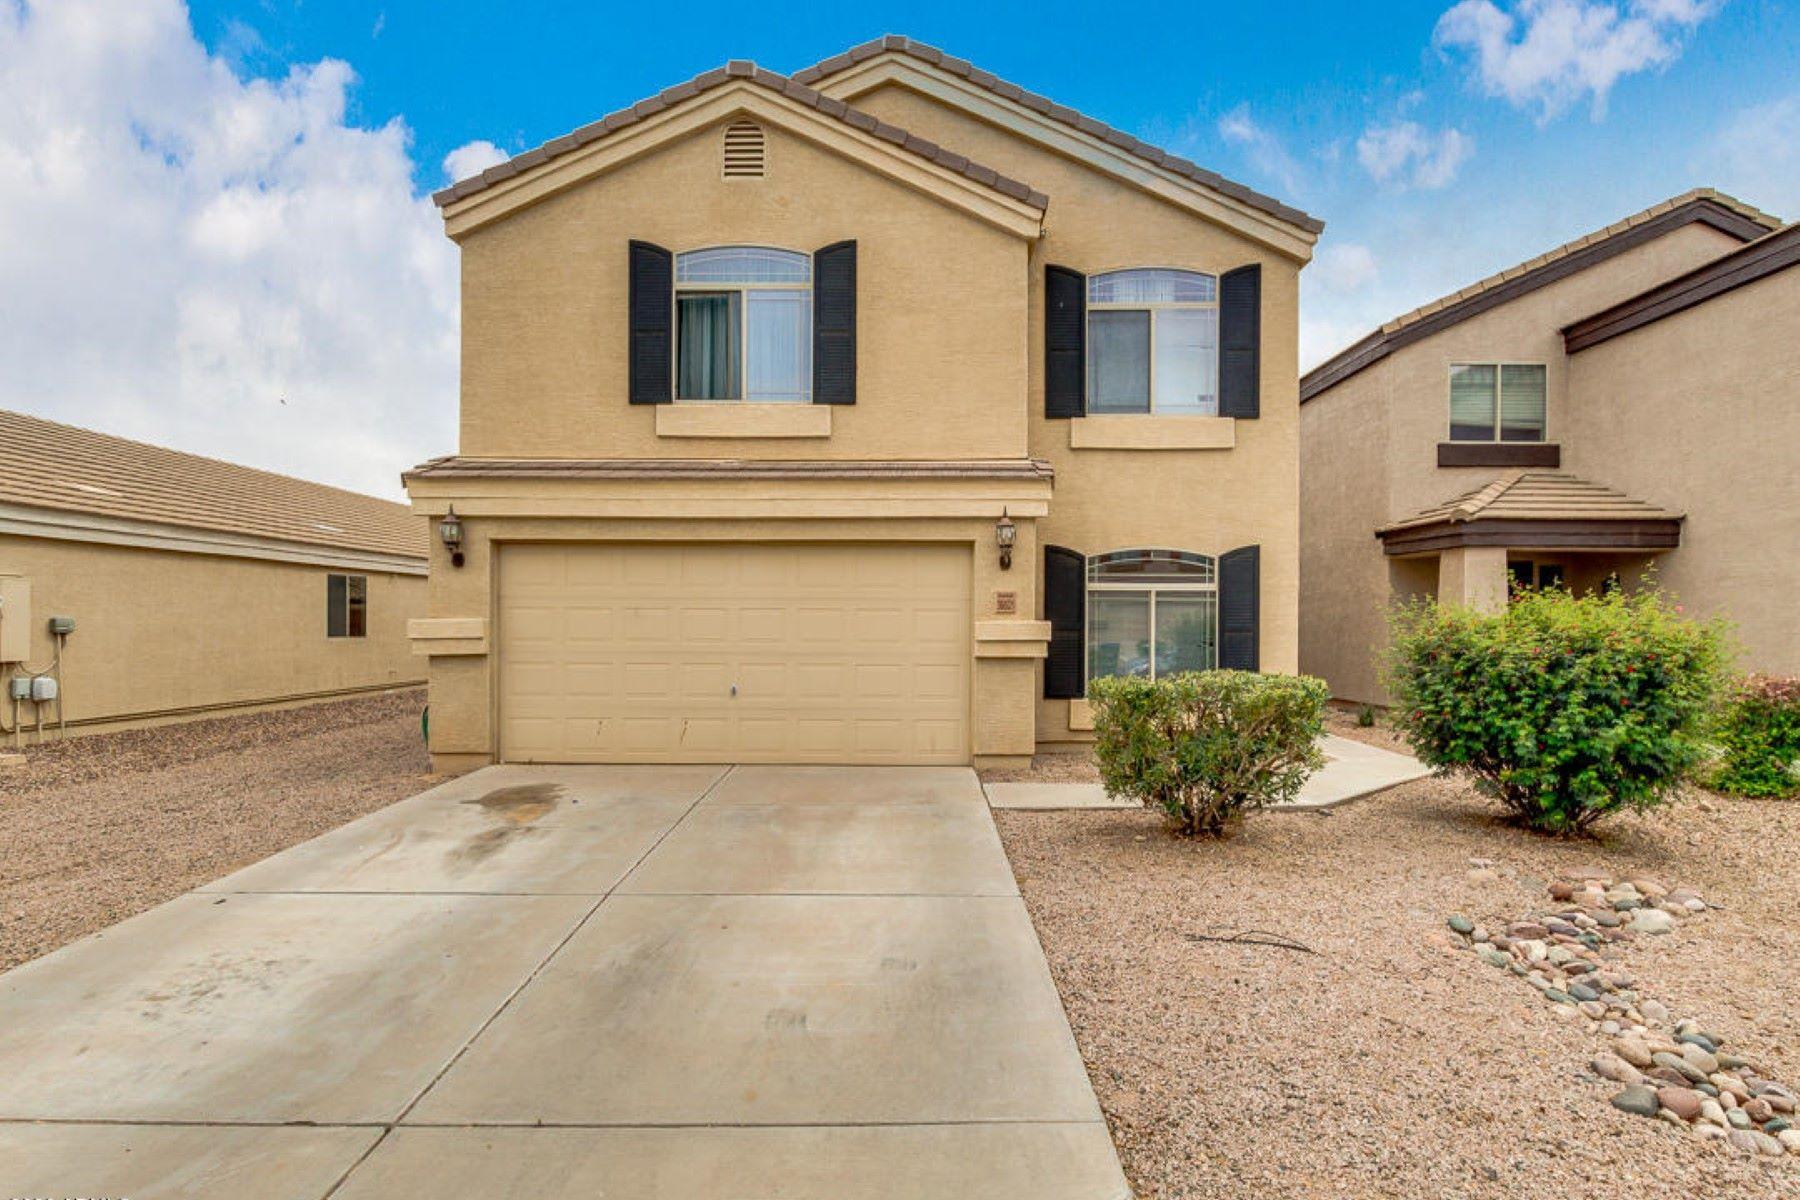 Single Family Homes για την Πώληση στο Tortosa 36521 W NINA ST, Maricopa, Αριζονα 85138 Ηνωμένες Πολιτείες